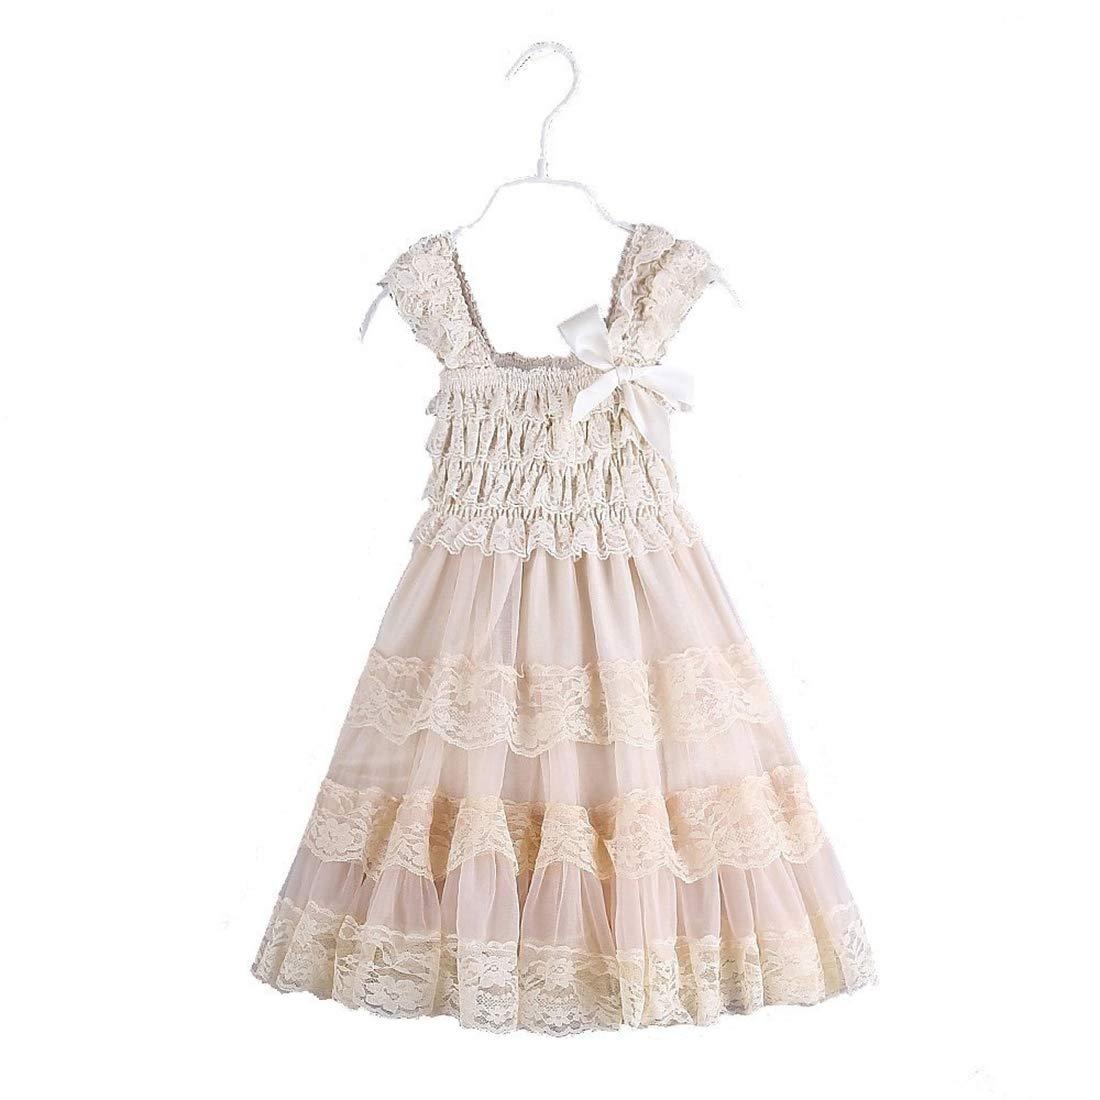 2016 encaje flor rústica arpillera niña bebé país boda flor vestido